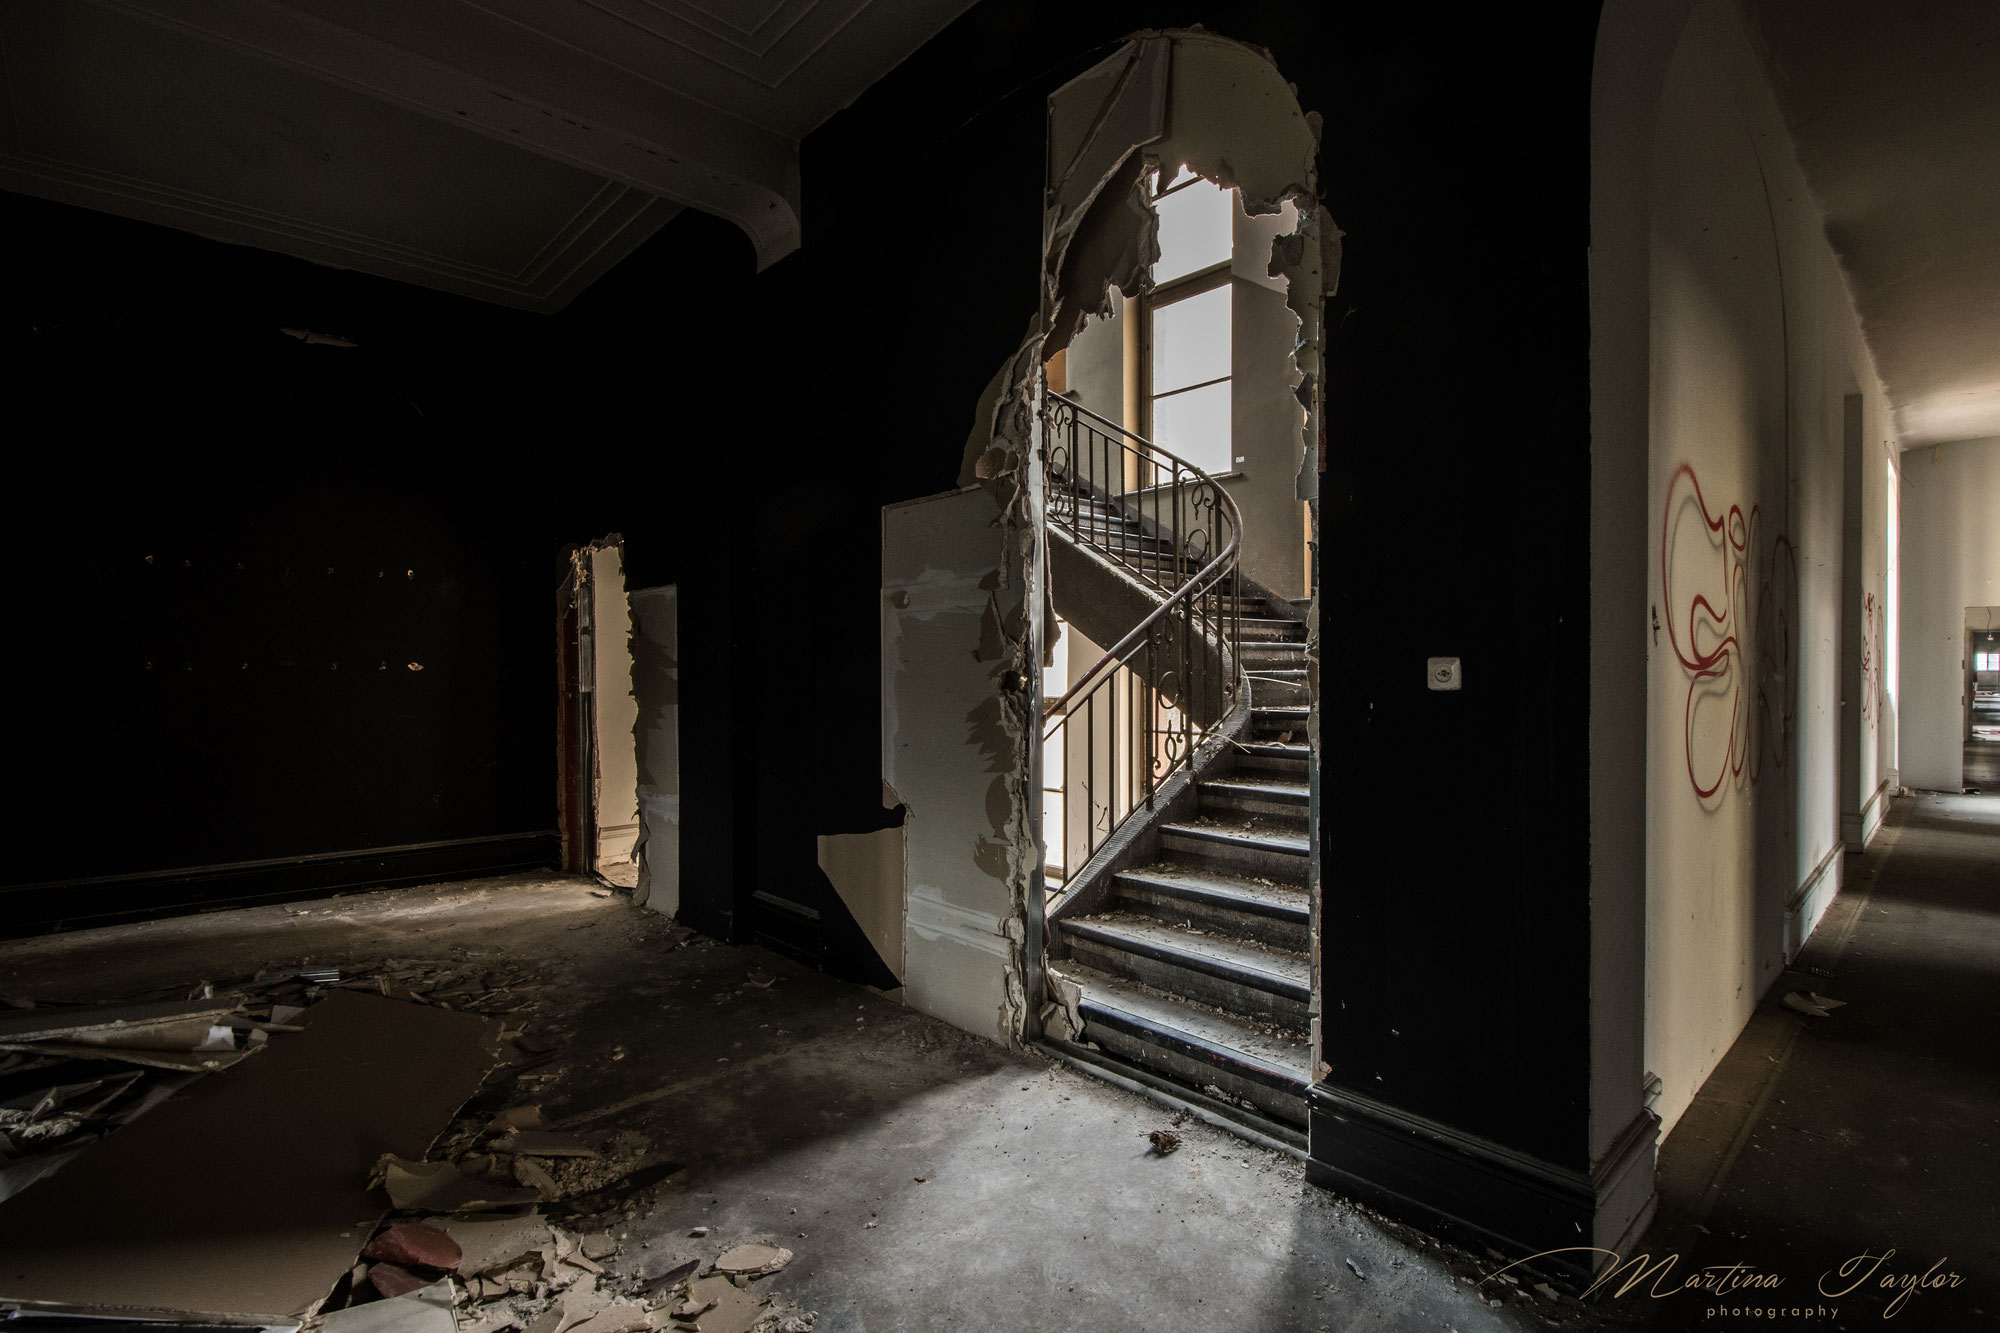 Lost Places: Fototour im Alten Polizeipräsidium